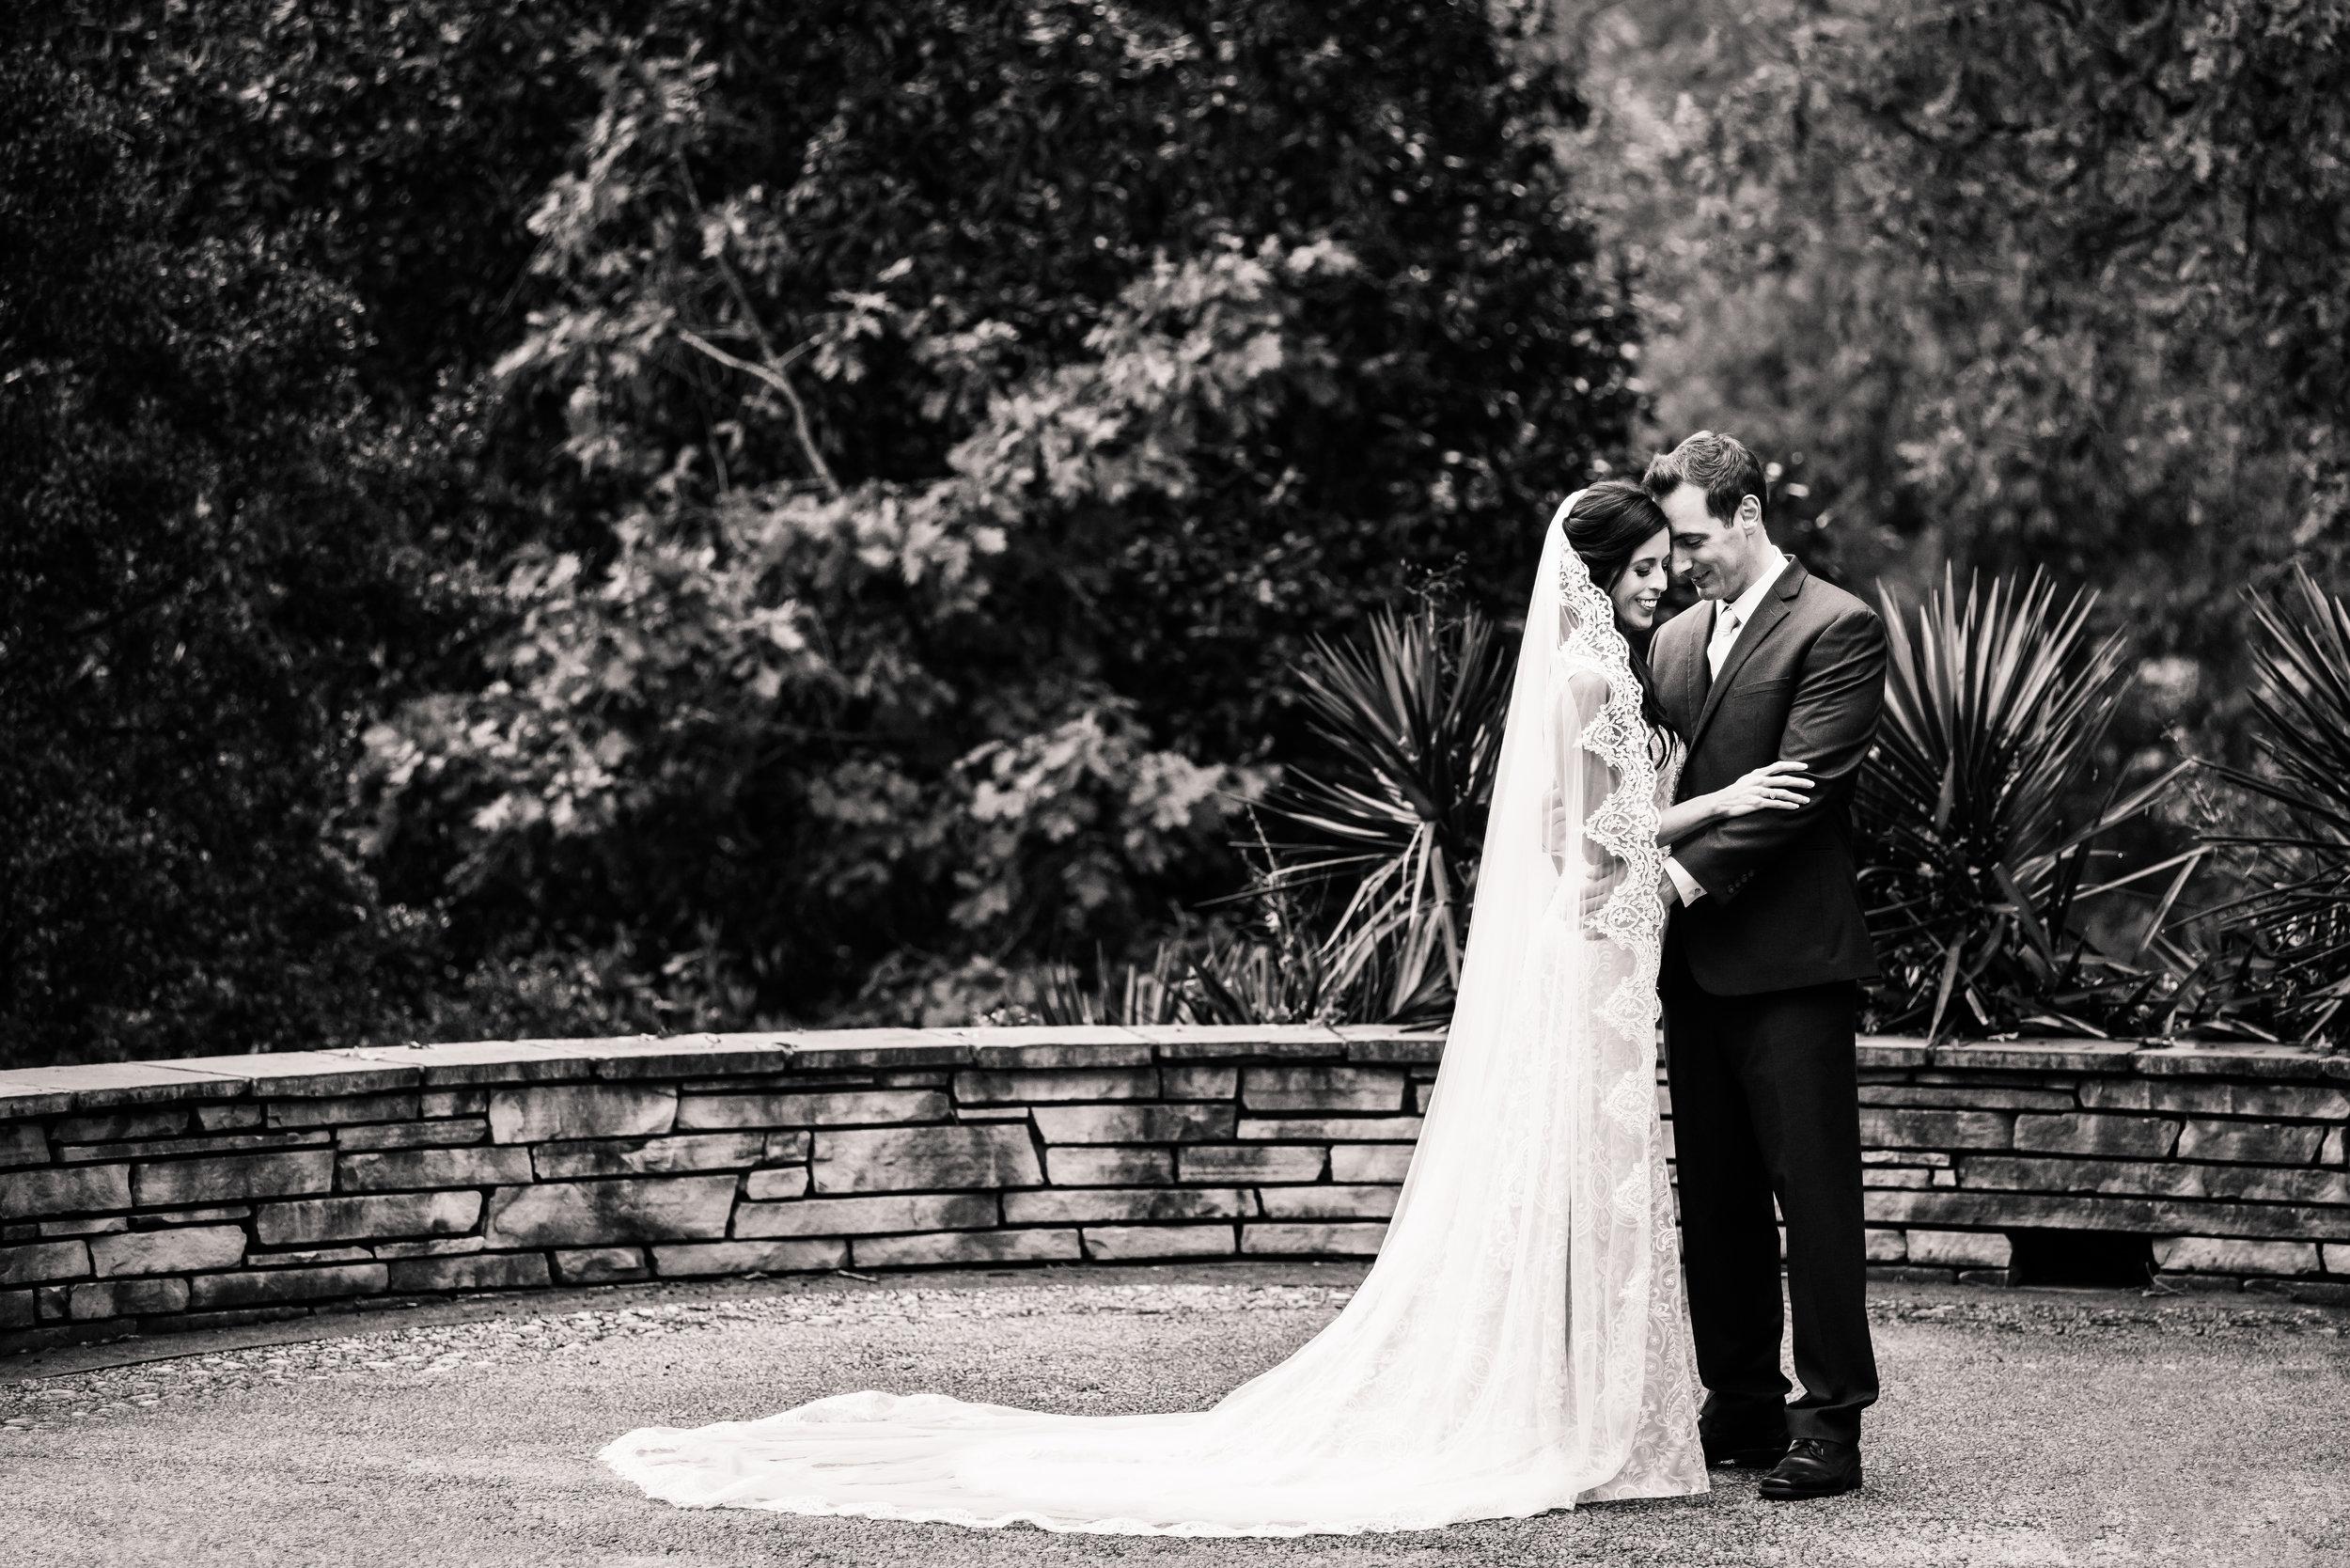 Heather & Lincoln Groves Wedding SP WEB_37.jpg